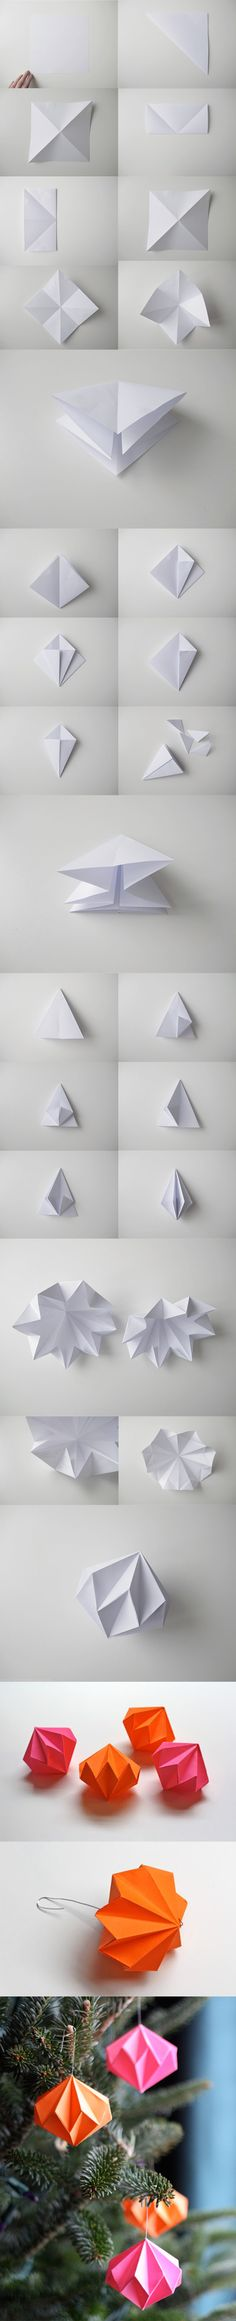 Diamantes de papel decorativos para Navidad / http://designoform.com/  /  http://howaboutorange.blogspot.com.es/                                                                                                                                                                                 Más